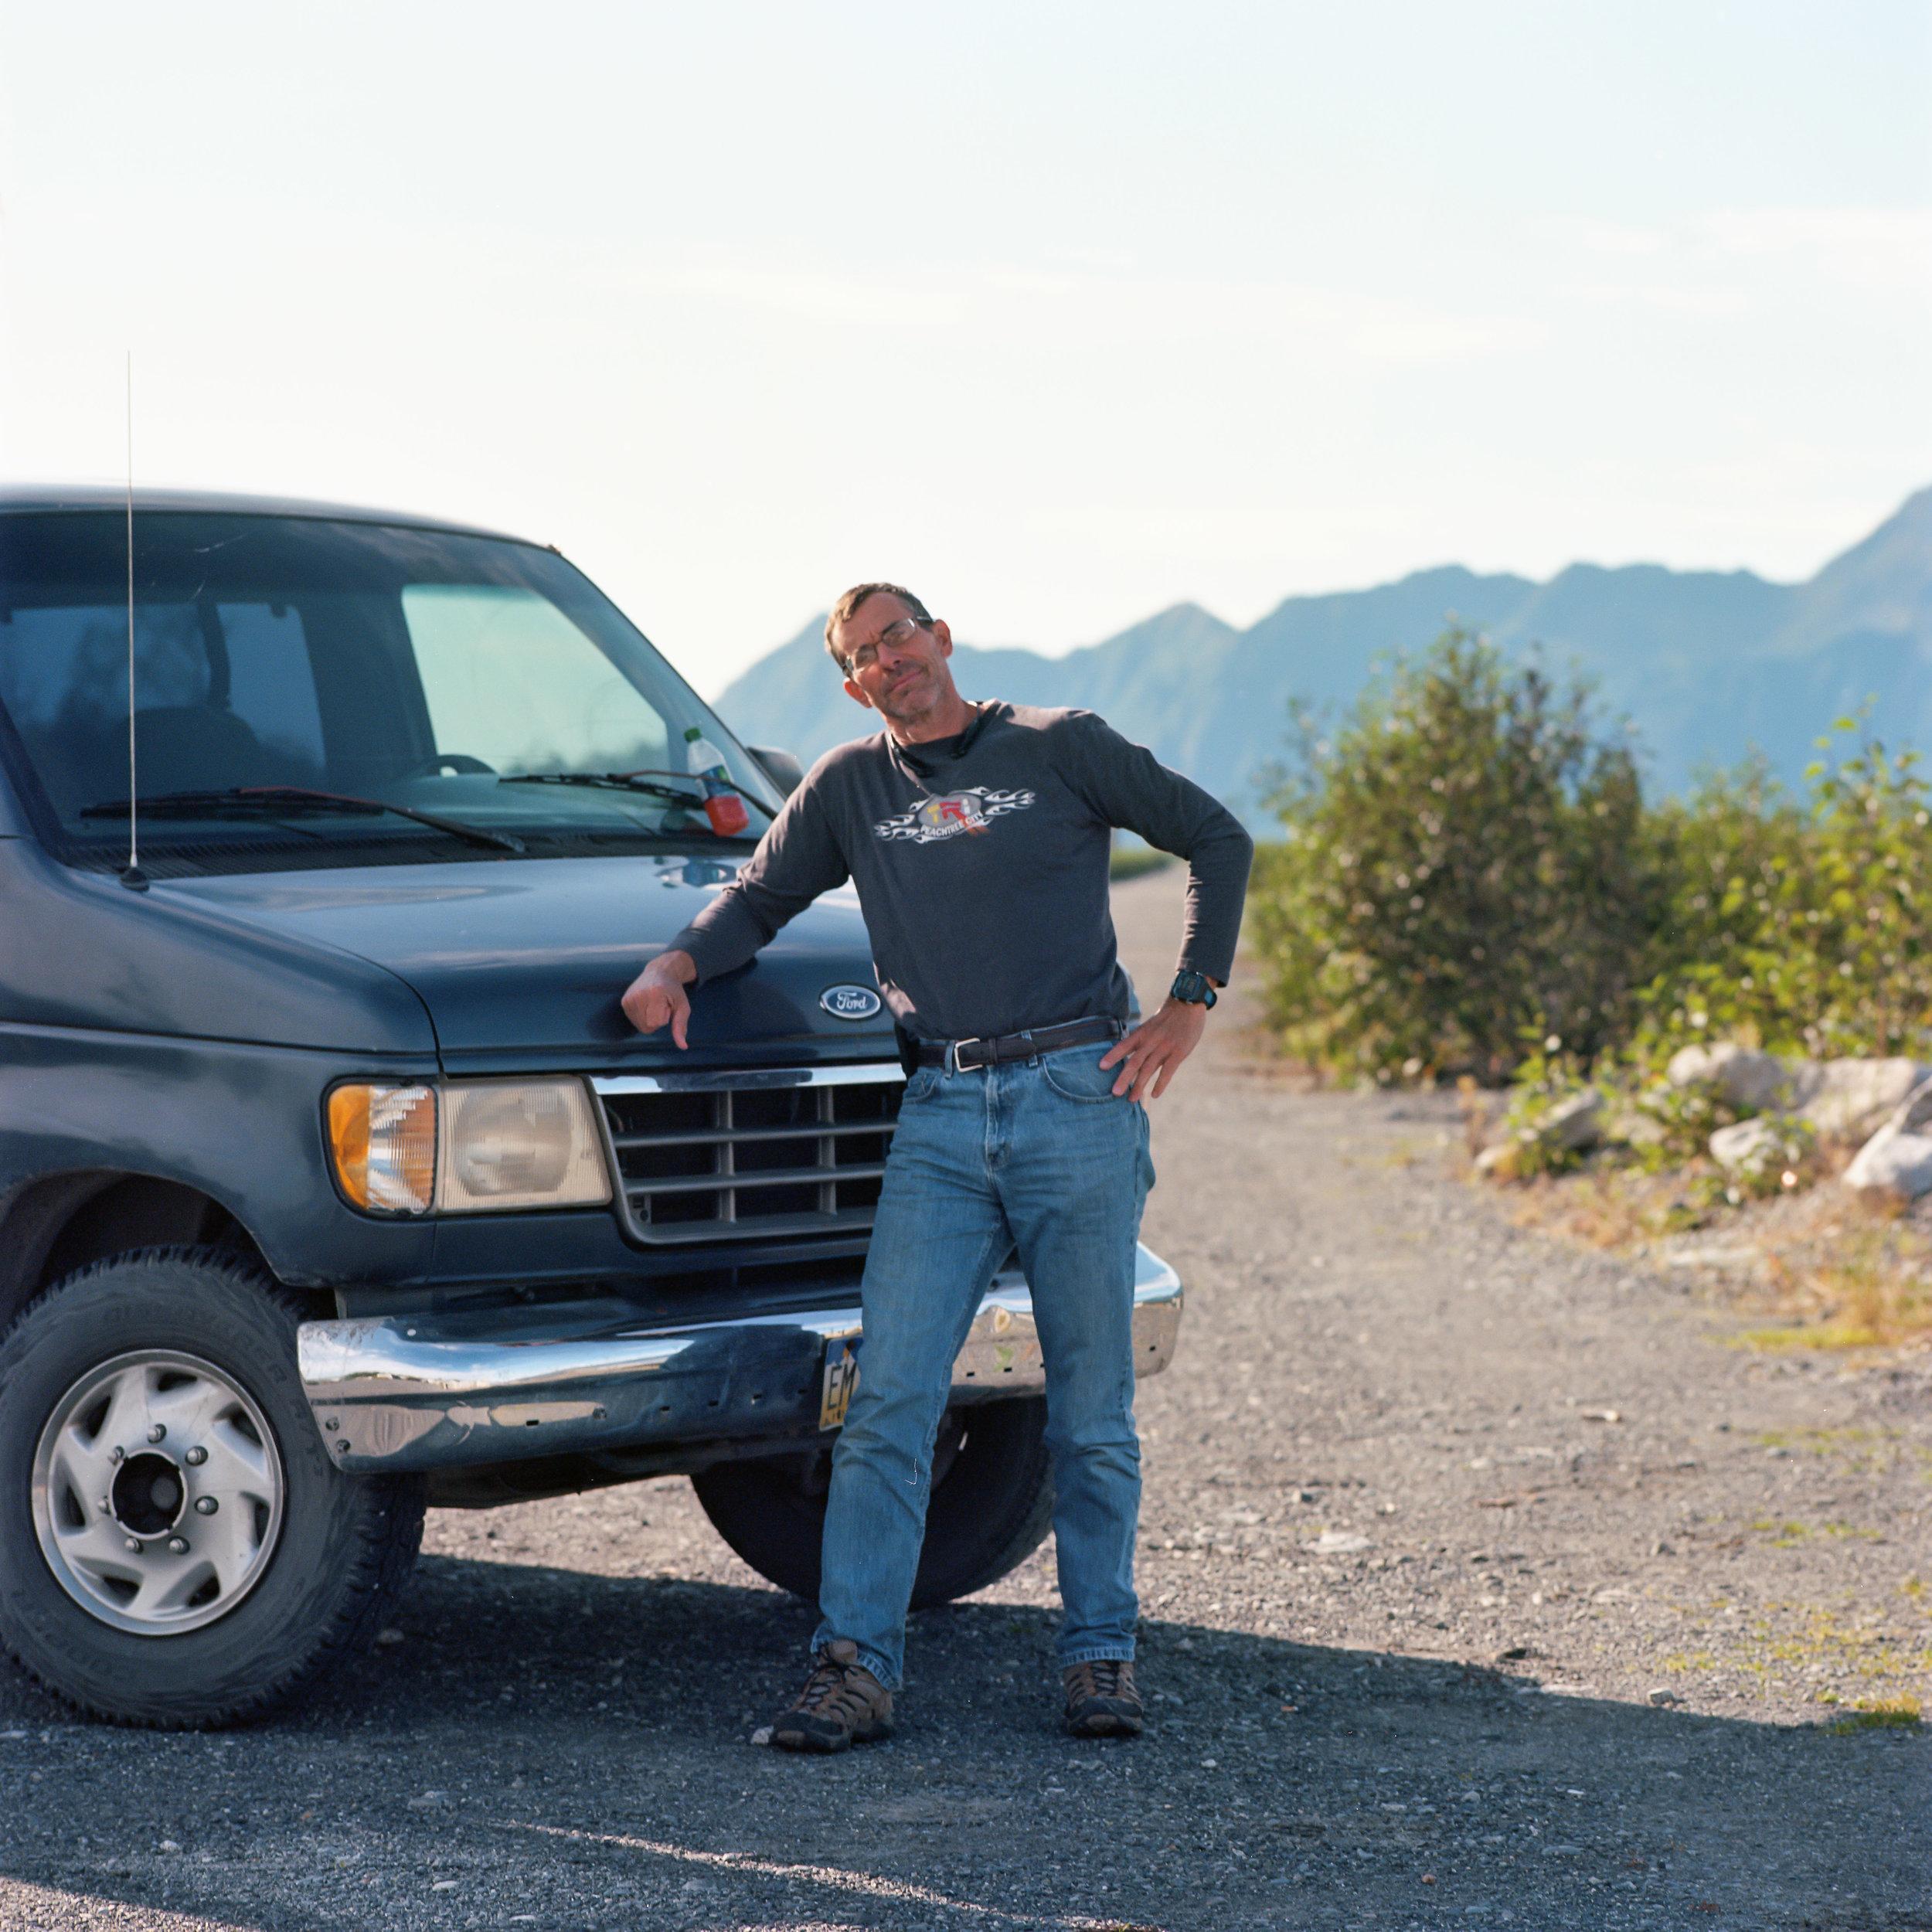 Dad at the end of the road Hasselblad 501cm   Kodak Ektar